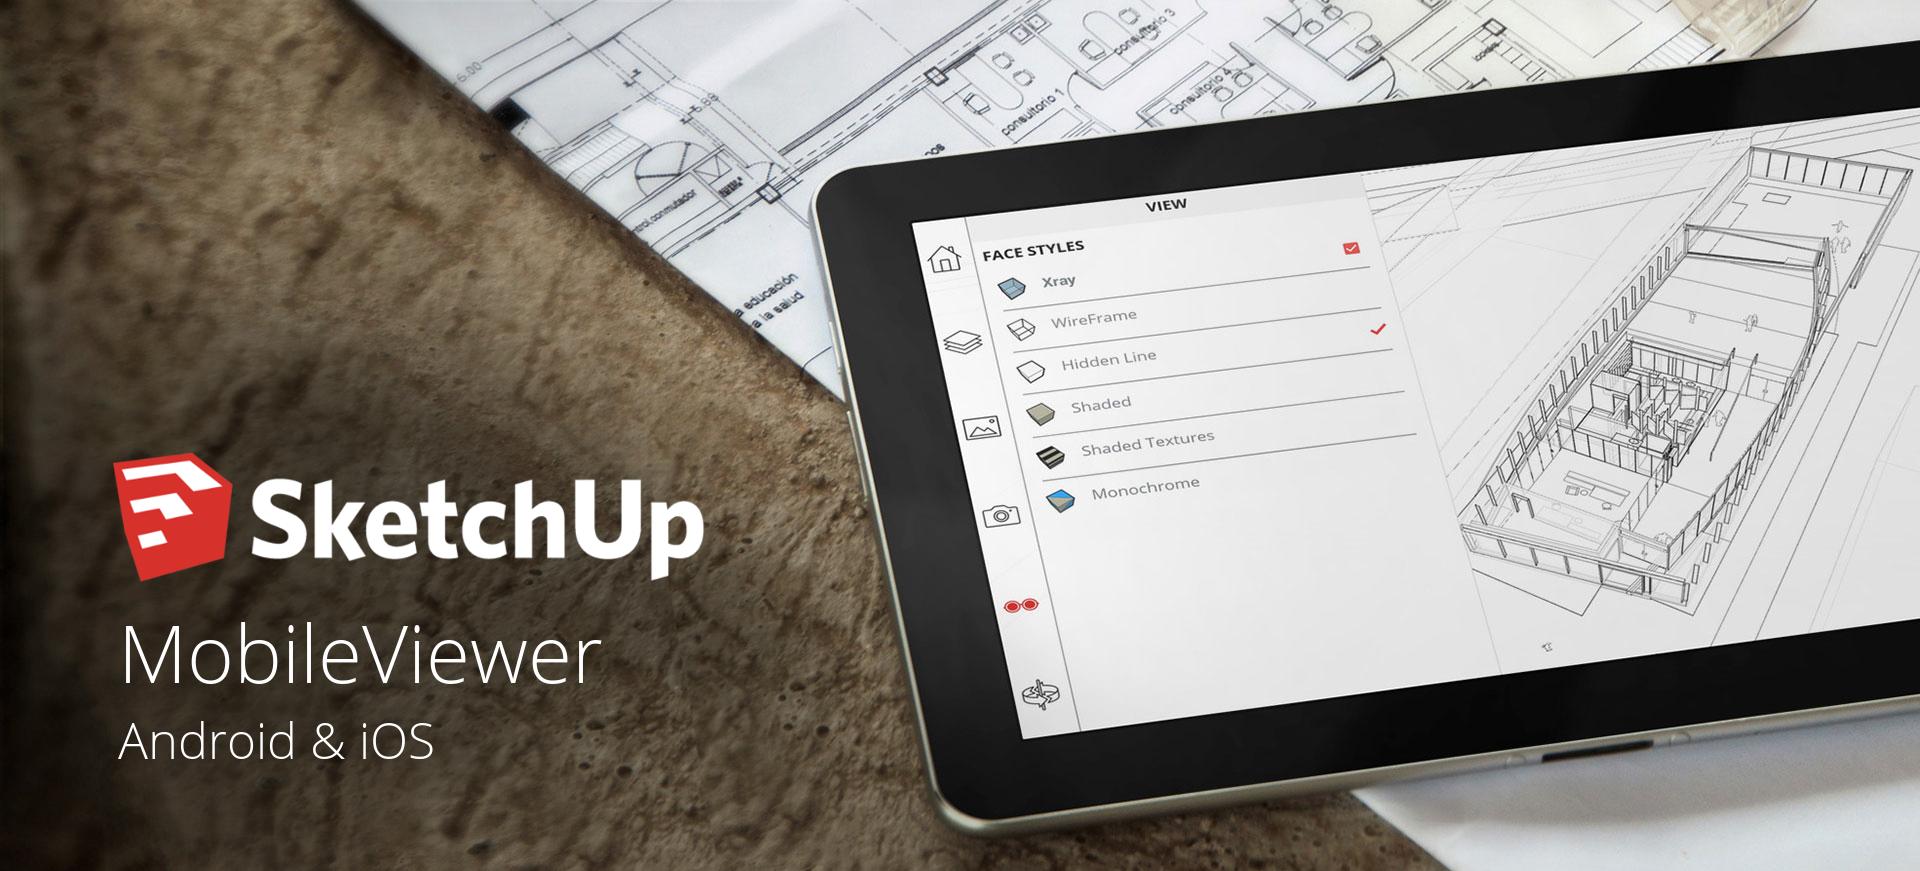 Sketchup mobileviewer